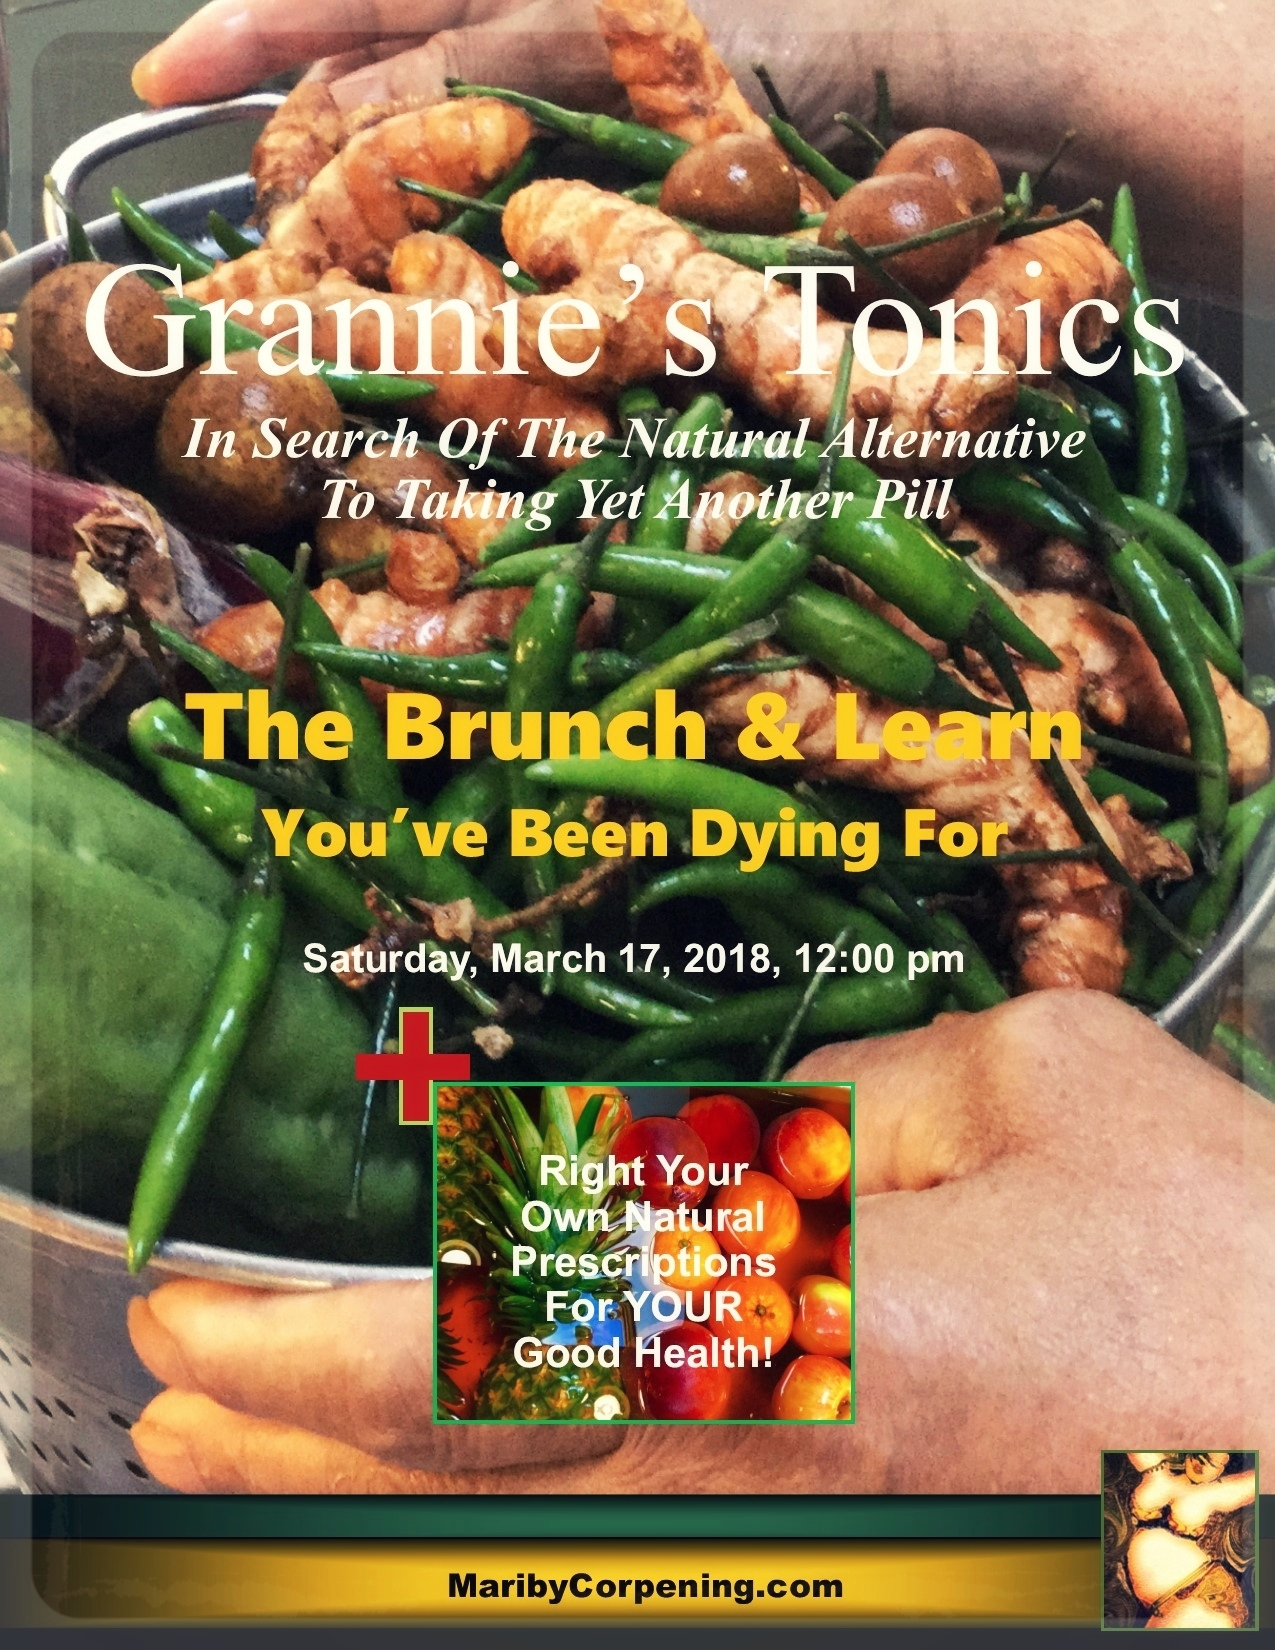 Flyer - Grannie's Tonics Brunch.jpg